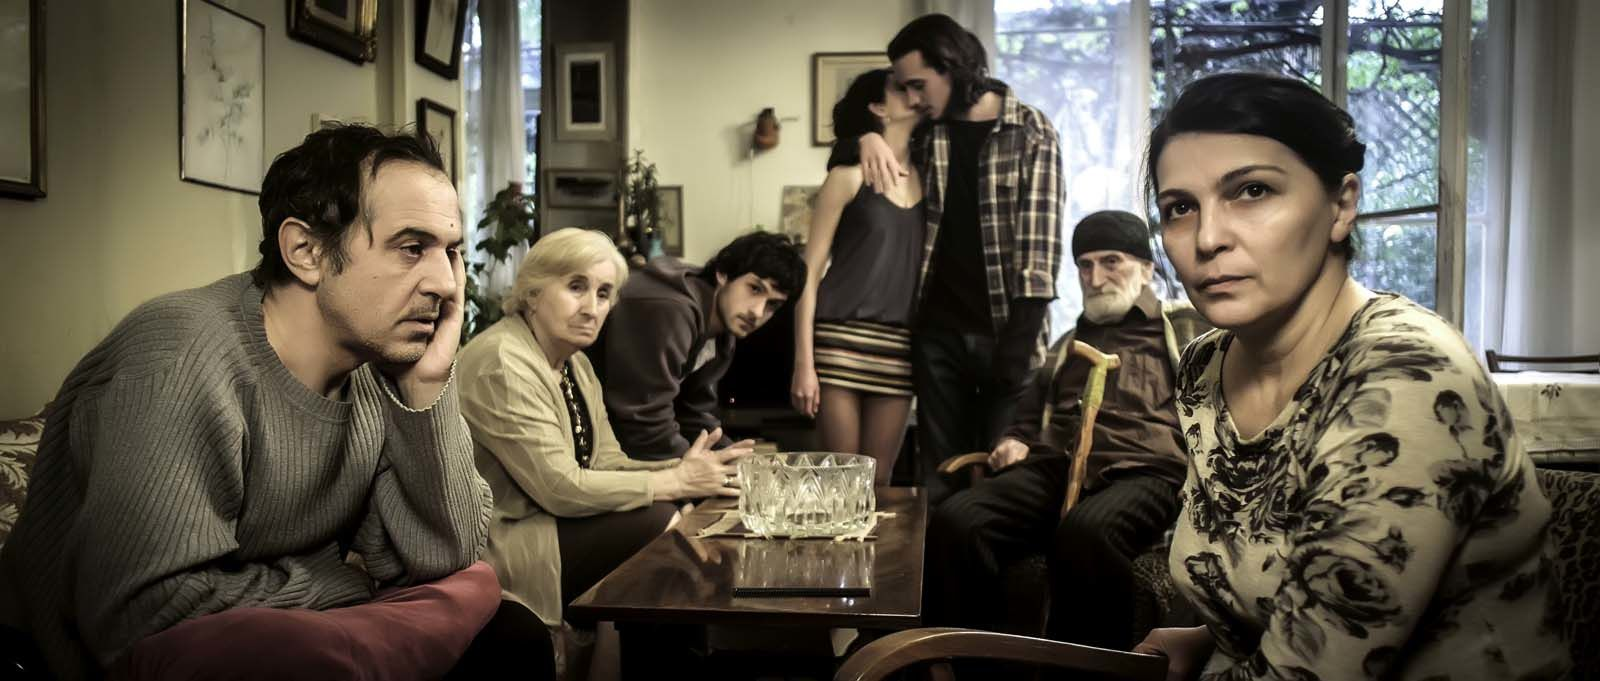 Une famille heureuse (BANDE ANNONCE) avec Ia Shugliashvili, Merab Ninidze - Le 10 mai 2017 au cinéma